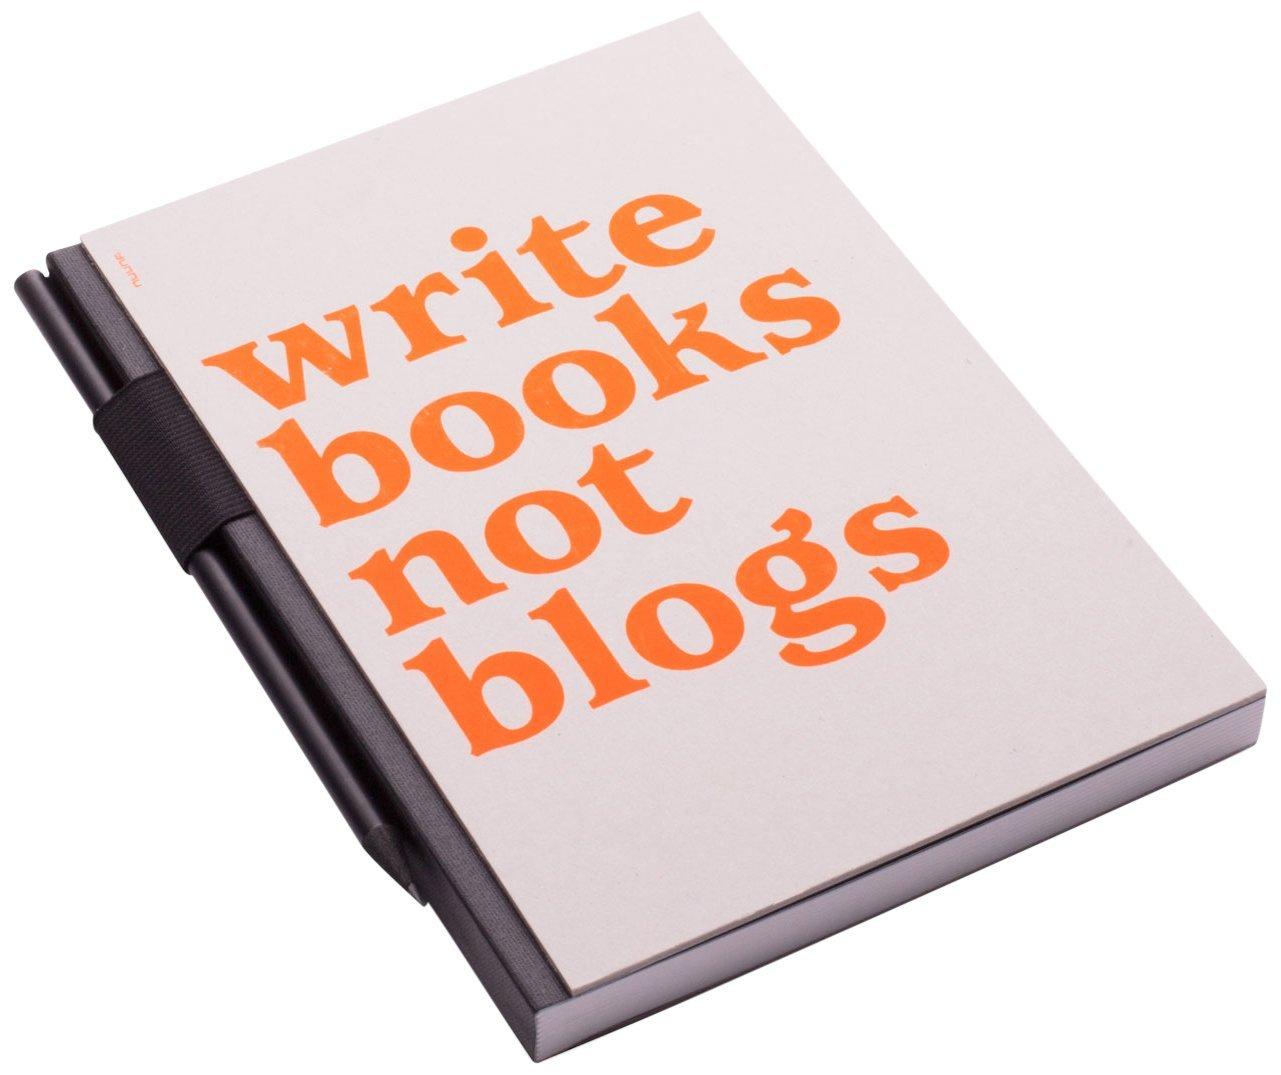 writebooksnotblogs.jpg